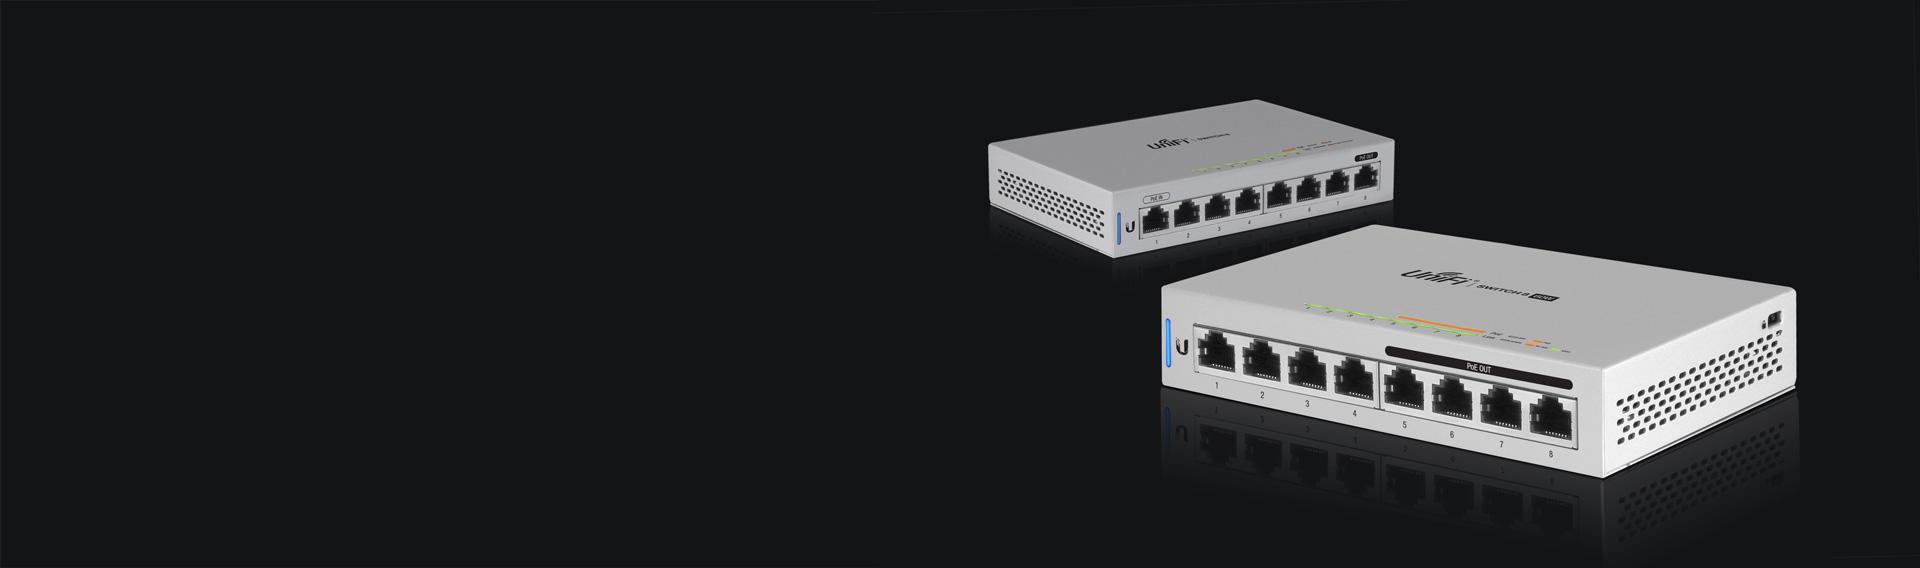 Ubiquiti Networks Unifi Switch 8 At Amp T U Verse Modem Wiring Diagram Fully Managed Gigabit